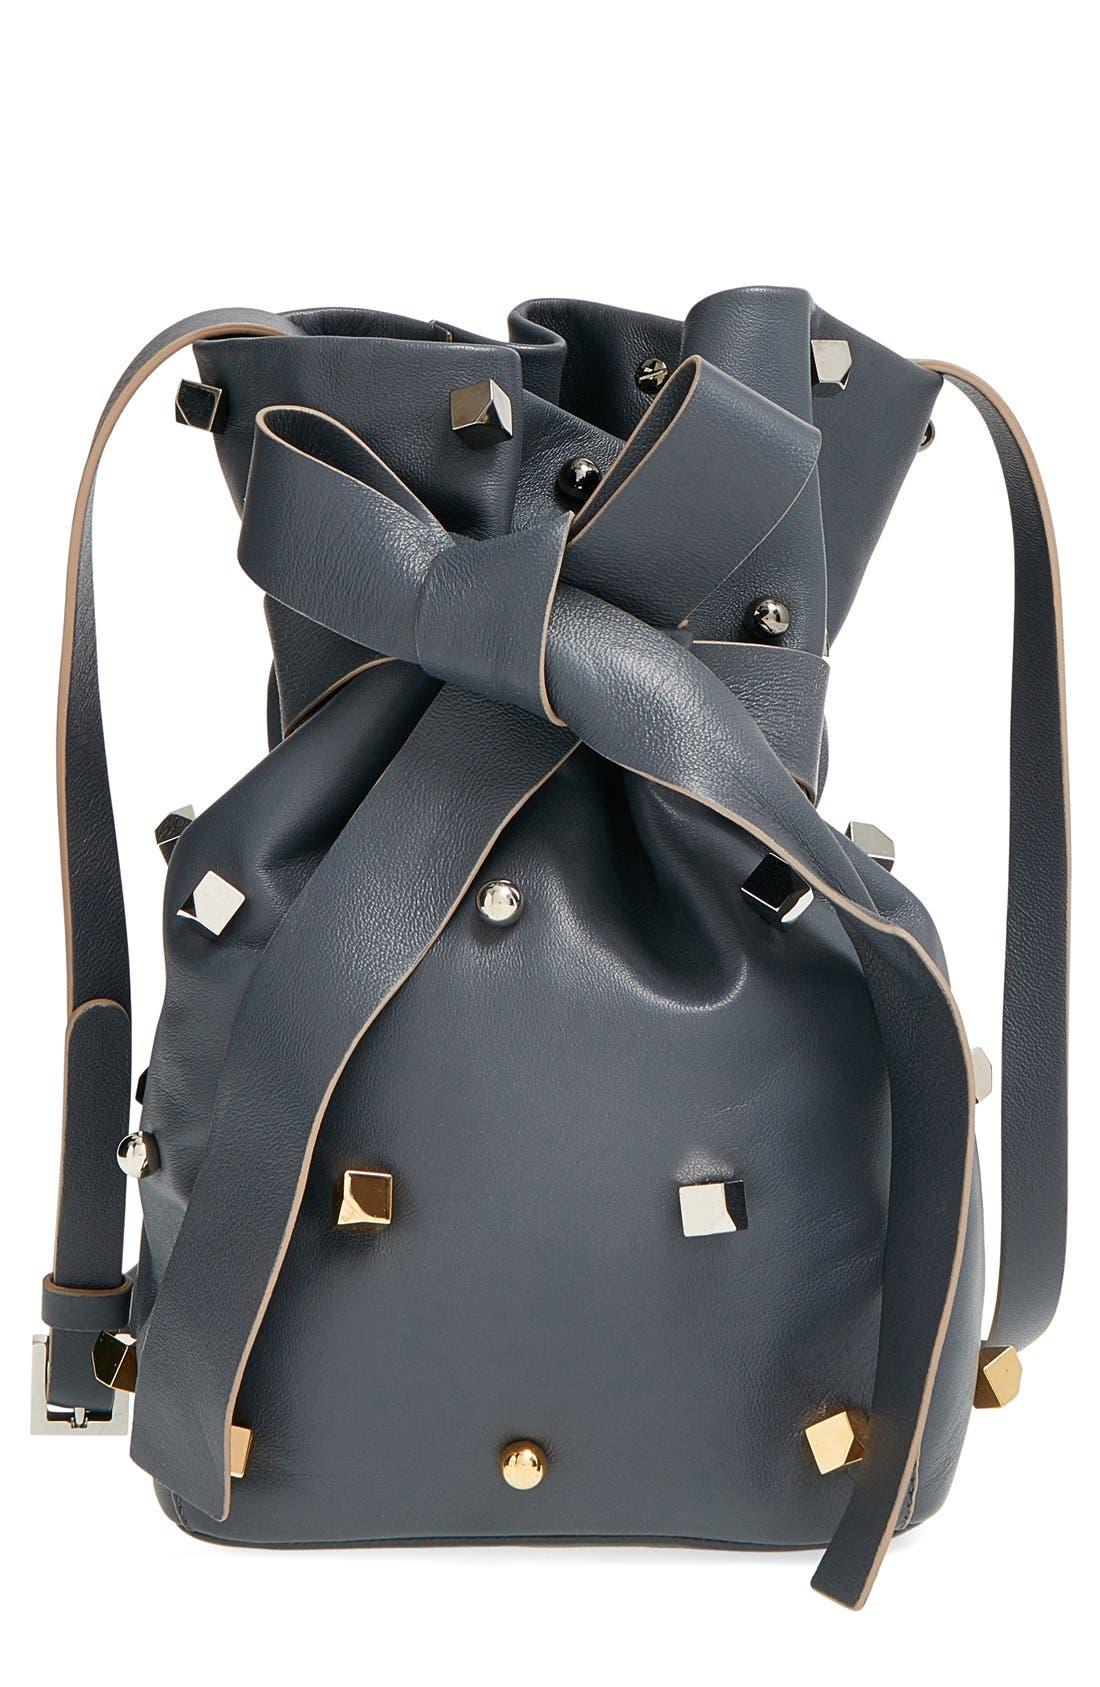 Alternate Image 1 Selected - Jimmy Choo 'Eve' Studded Bucket Bag